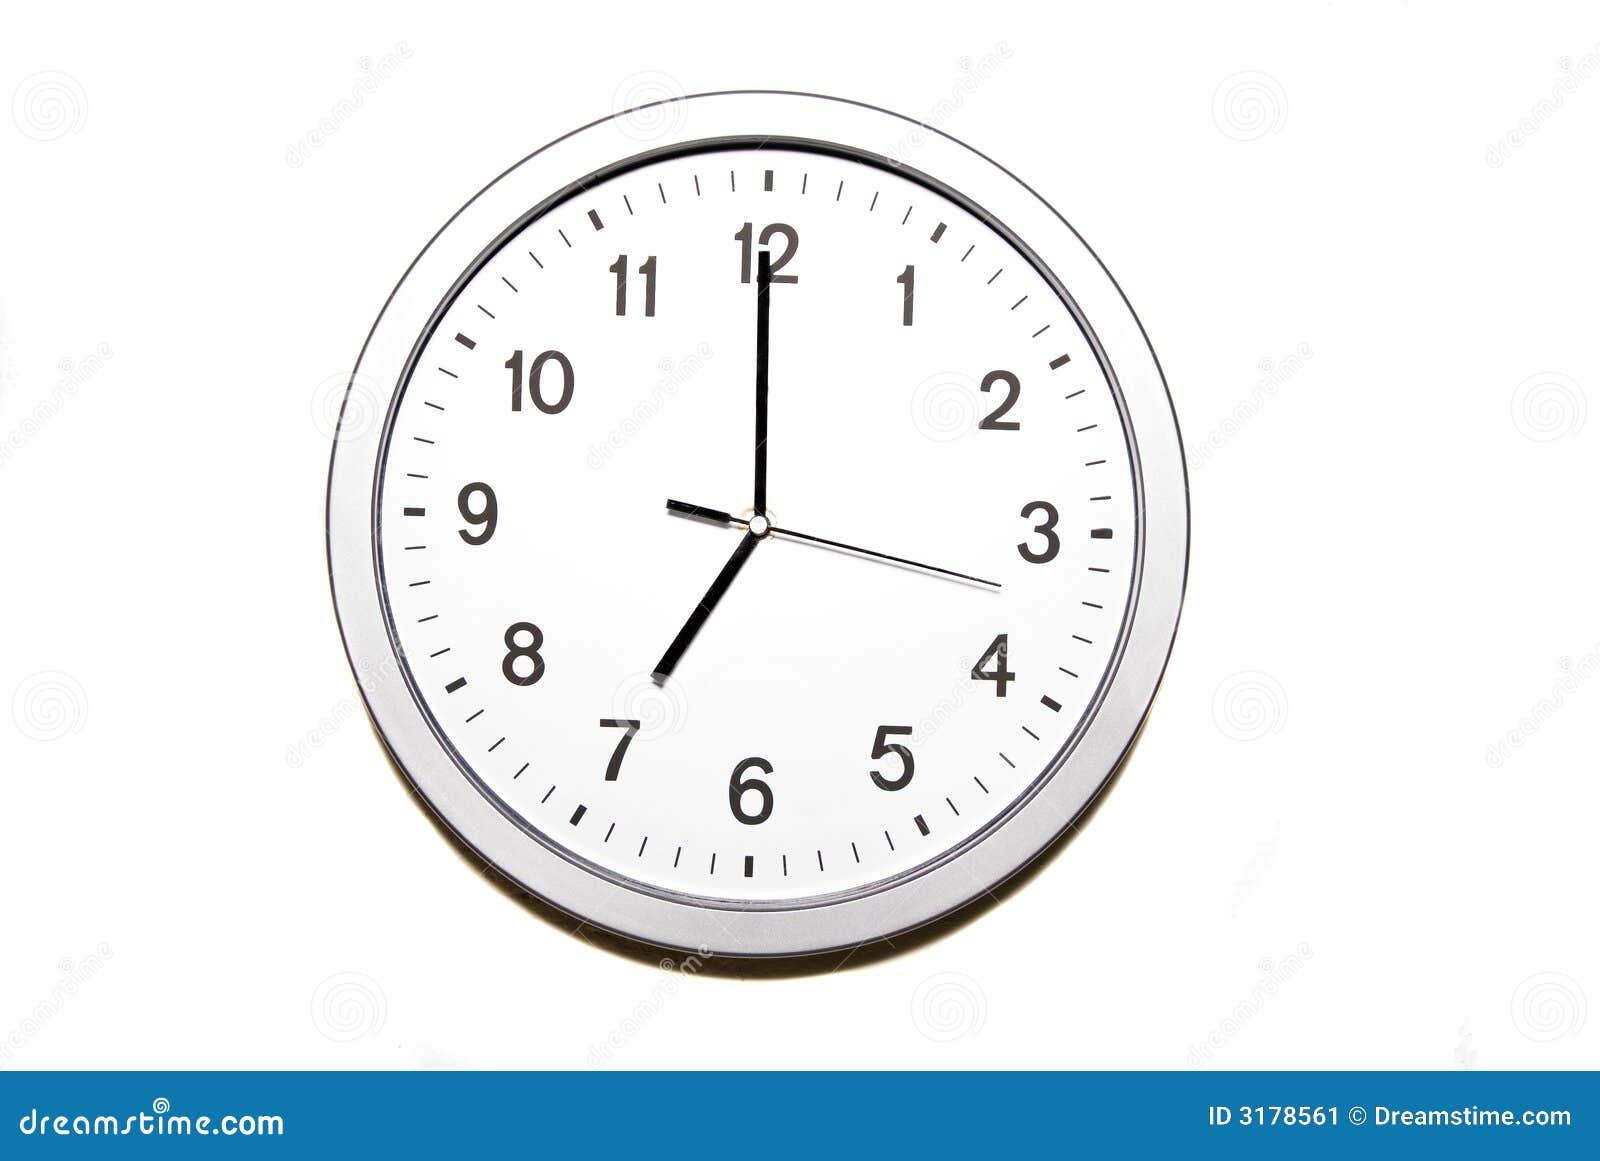 seven o clock stock image image 3178561 Clock for Telling Time Clip Art clock clipart for teachers